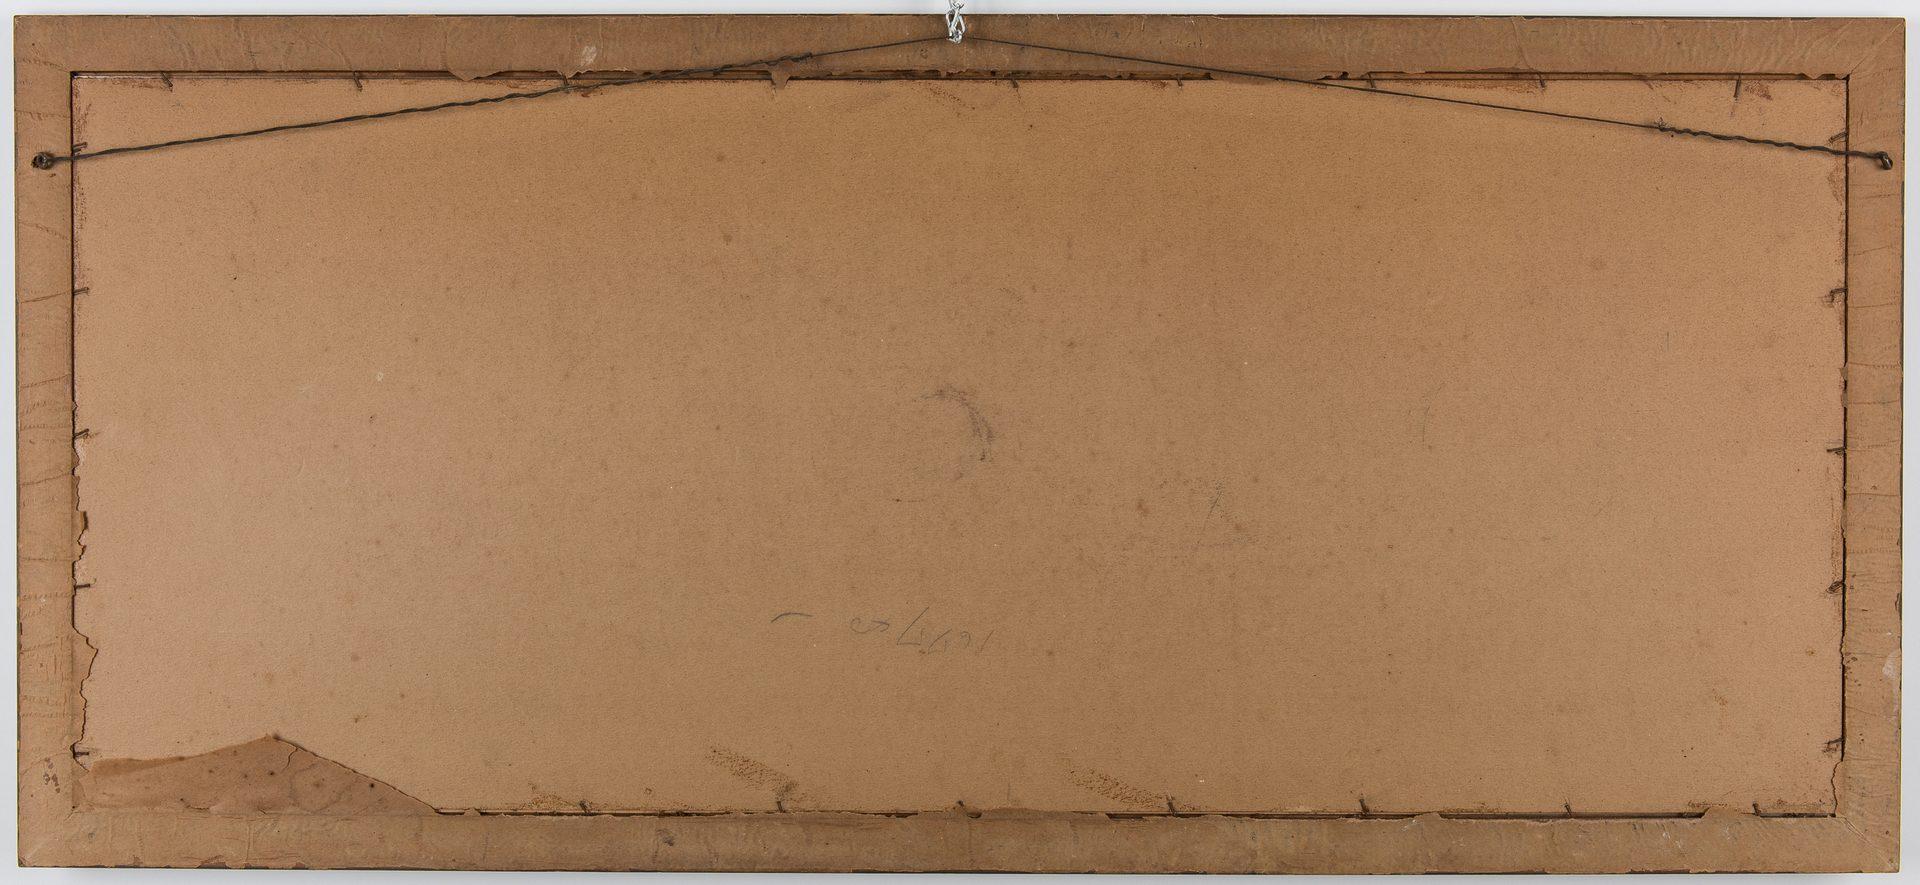 Lot 380: Boyd Portrait & Pr. of Phototypes and Print